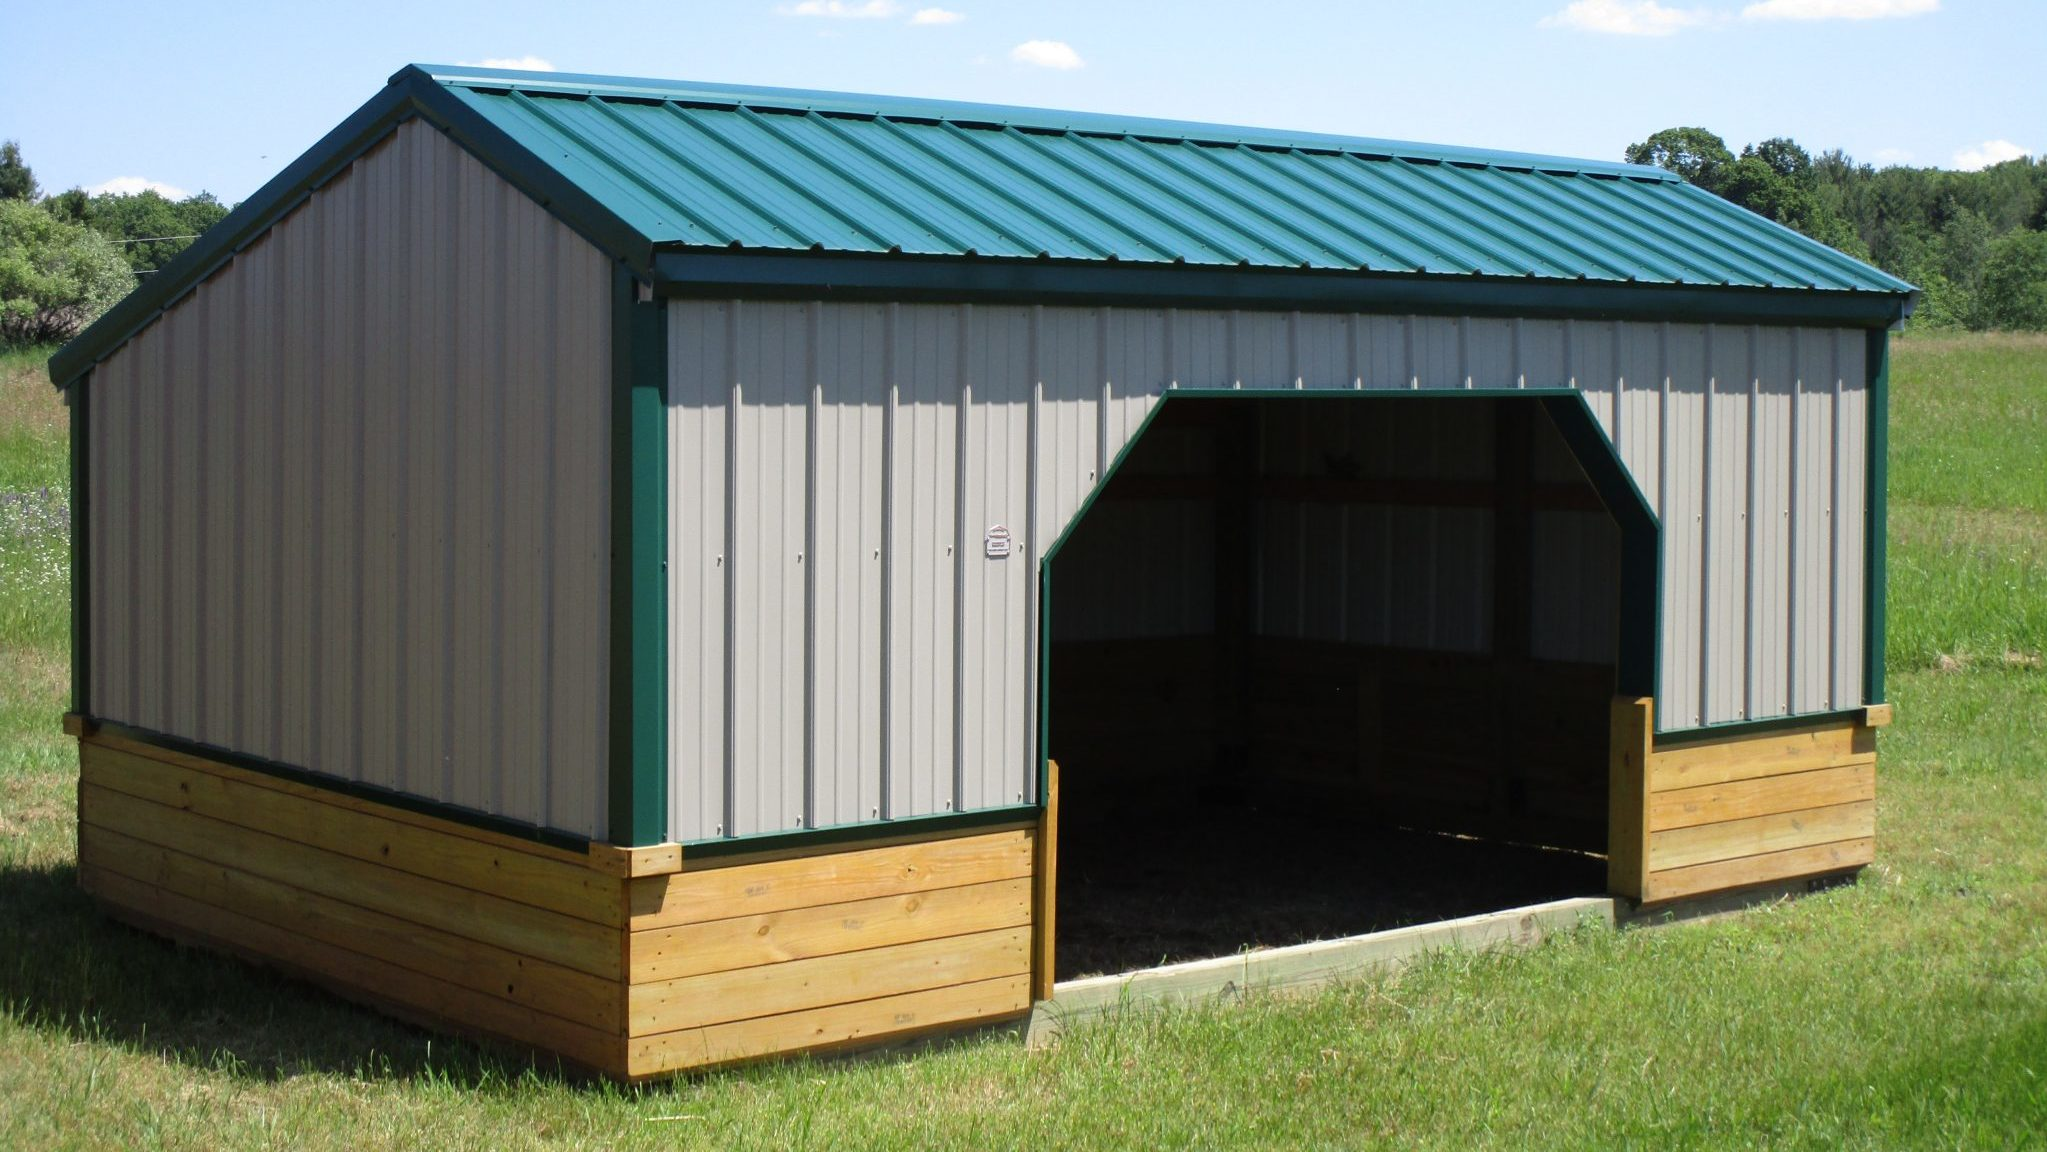 animal shelter amish buildings michigan